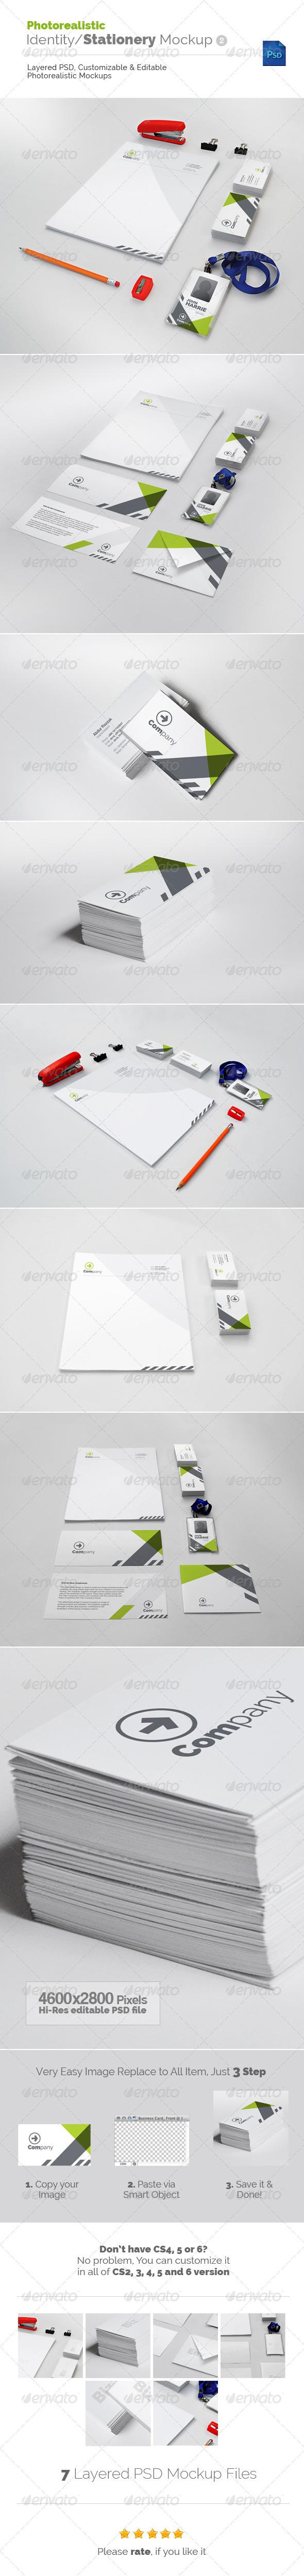 GraphicRiver Photorealistic Identity Stationery Mockup v2 5428804